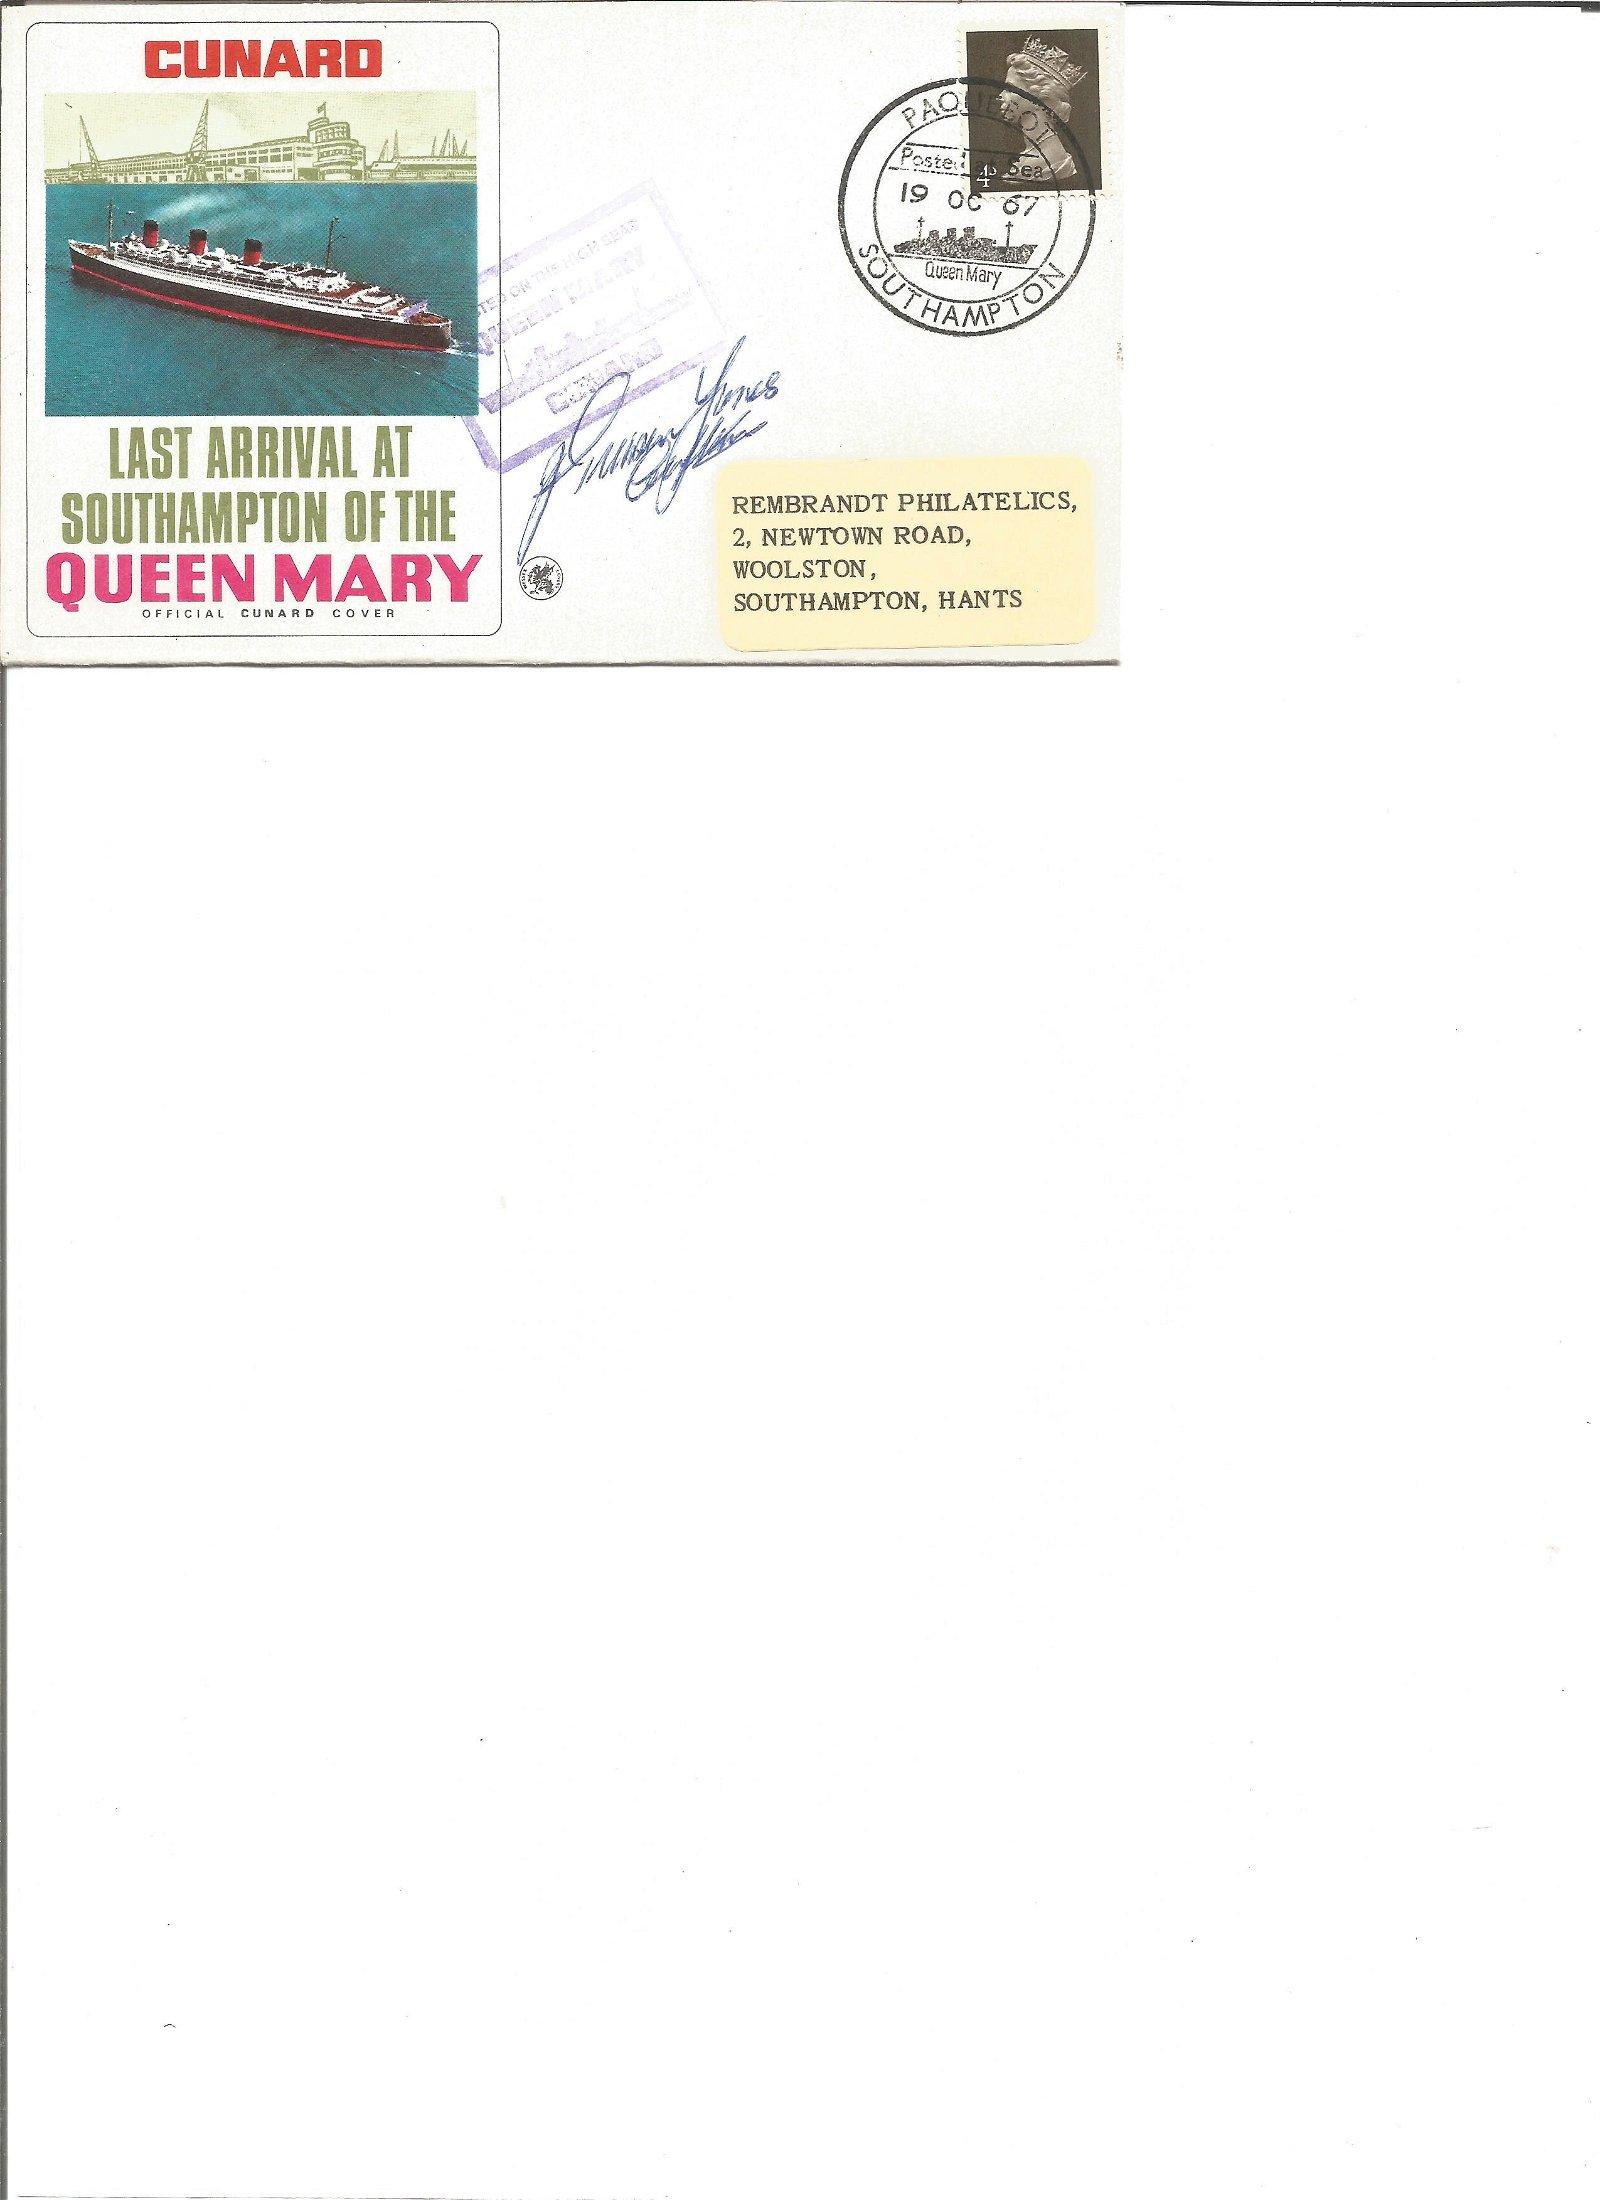 Cptn John Treasure Jones signed Cunard cover. Good